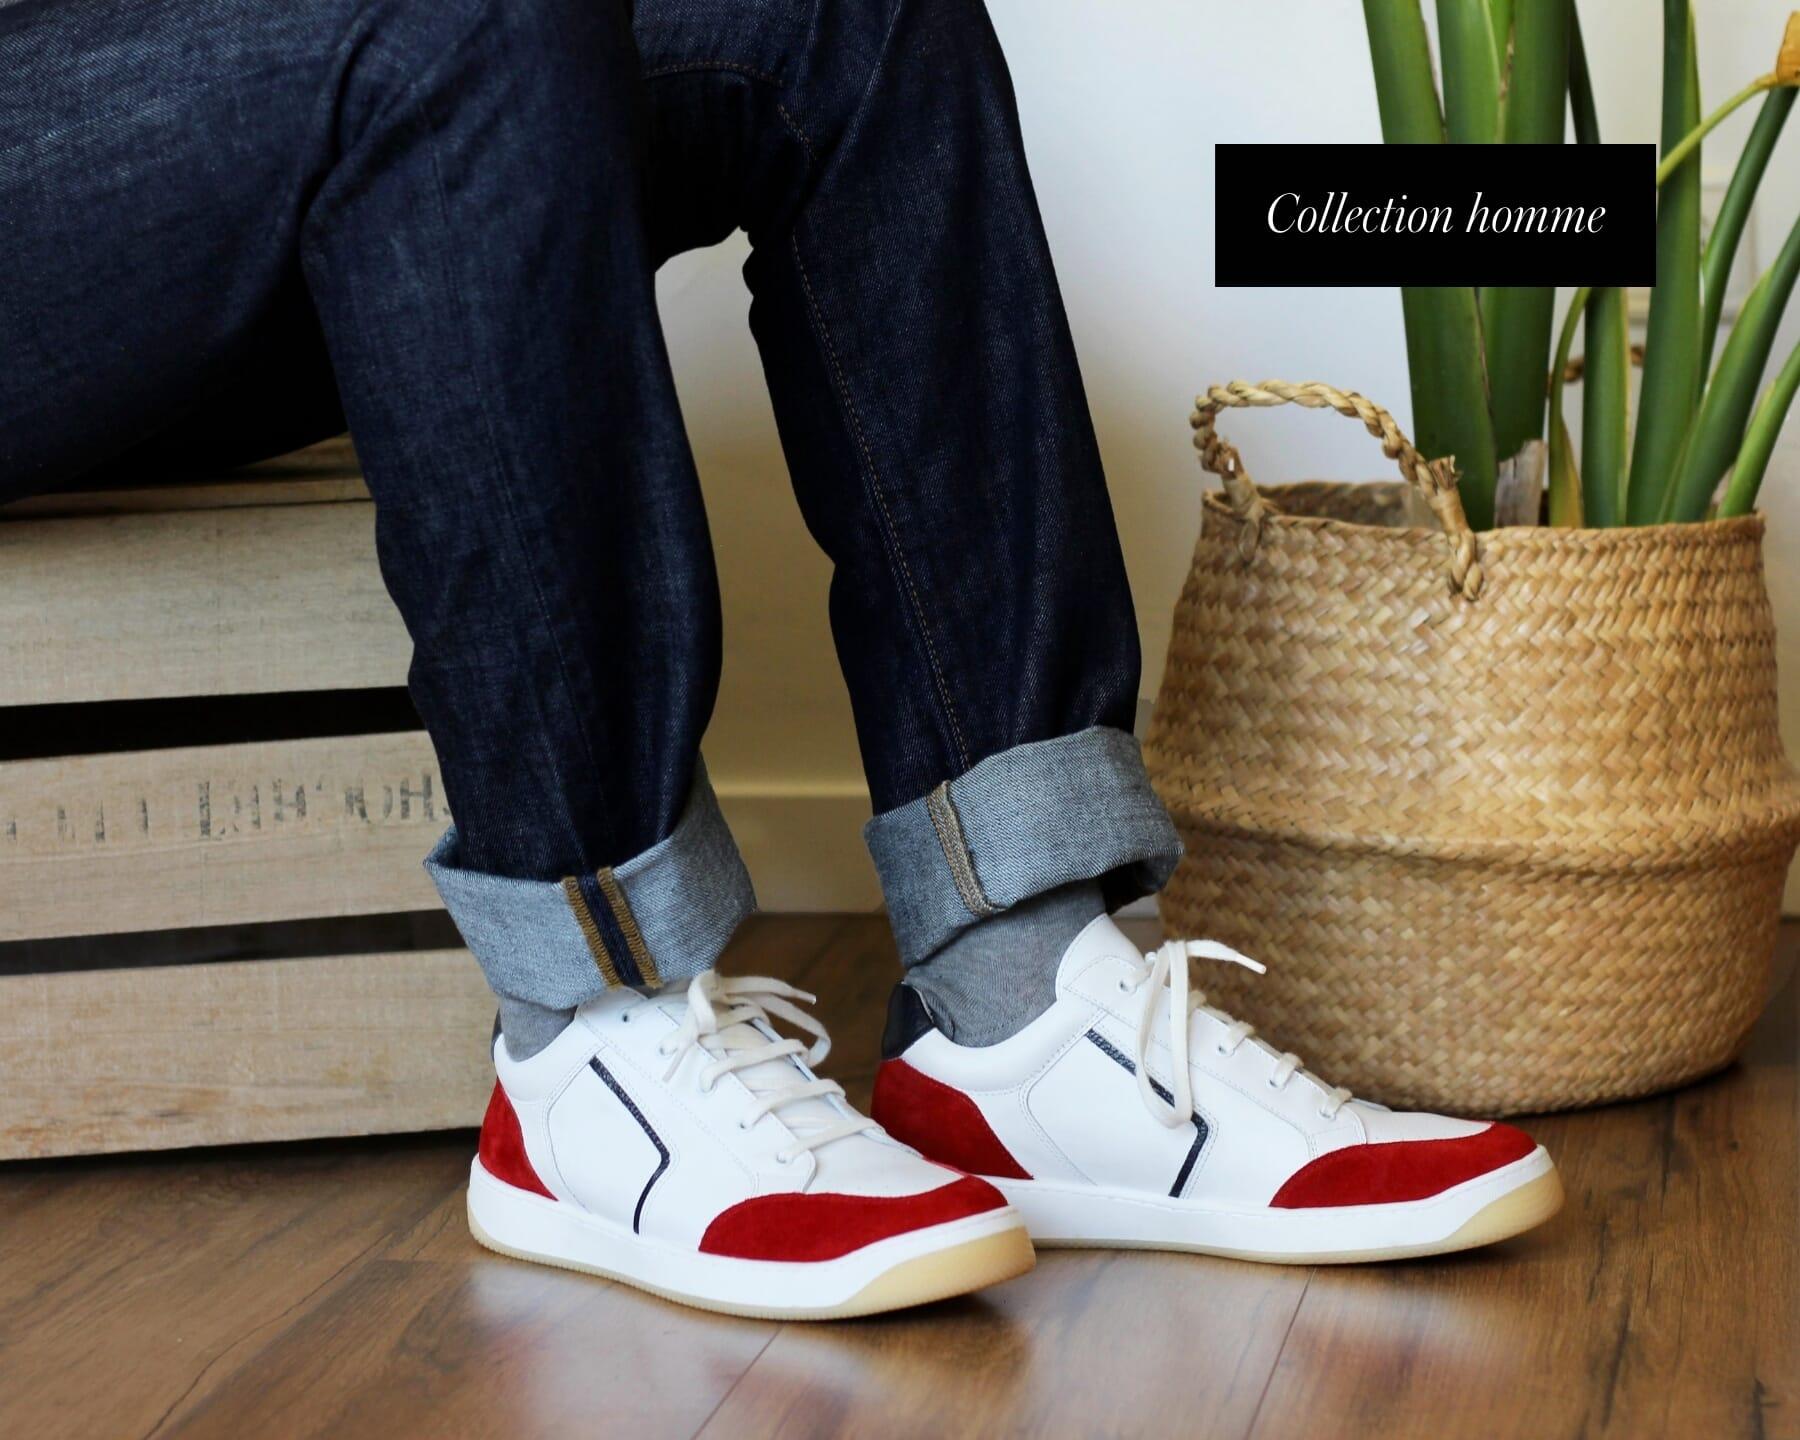 baskets retro homme cuir blanc rouge jules & jenn